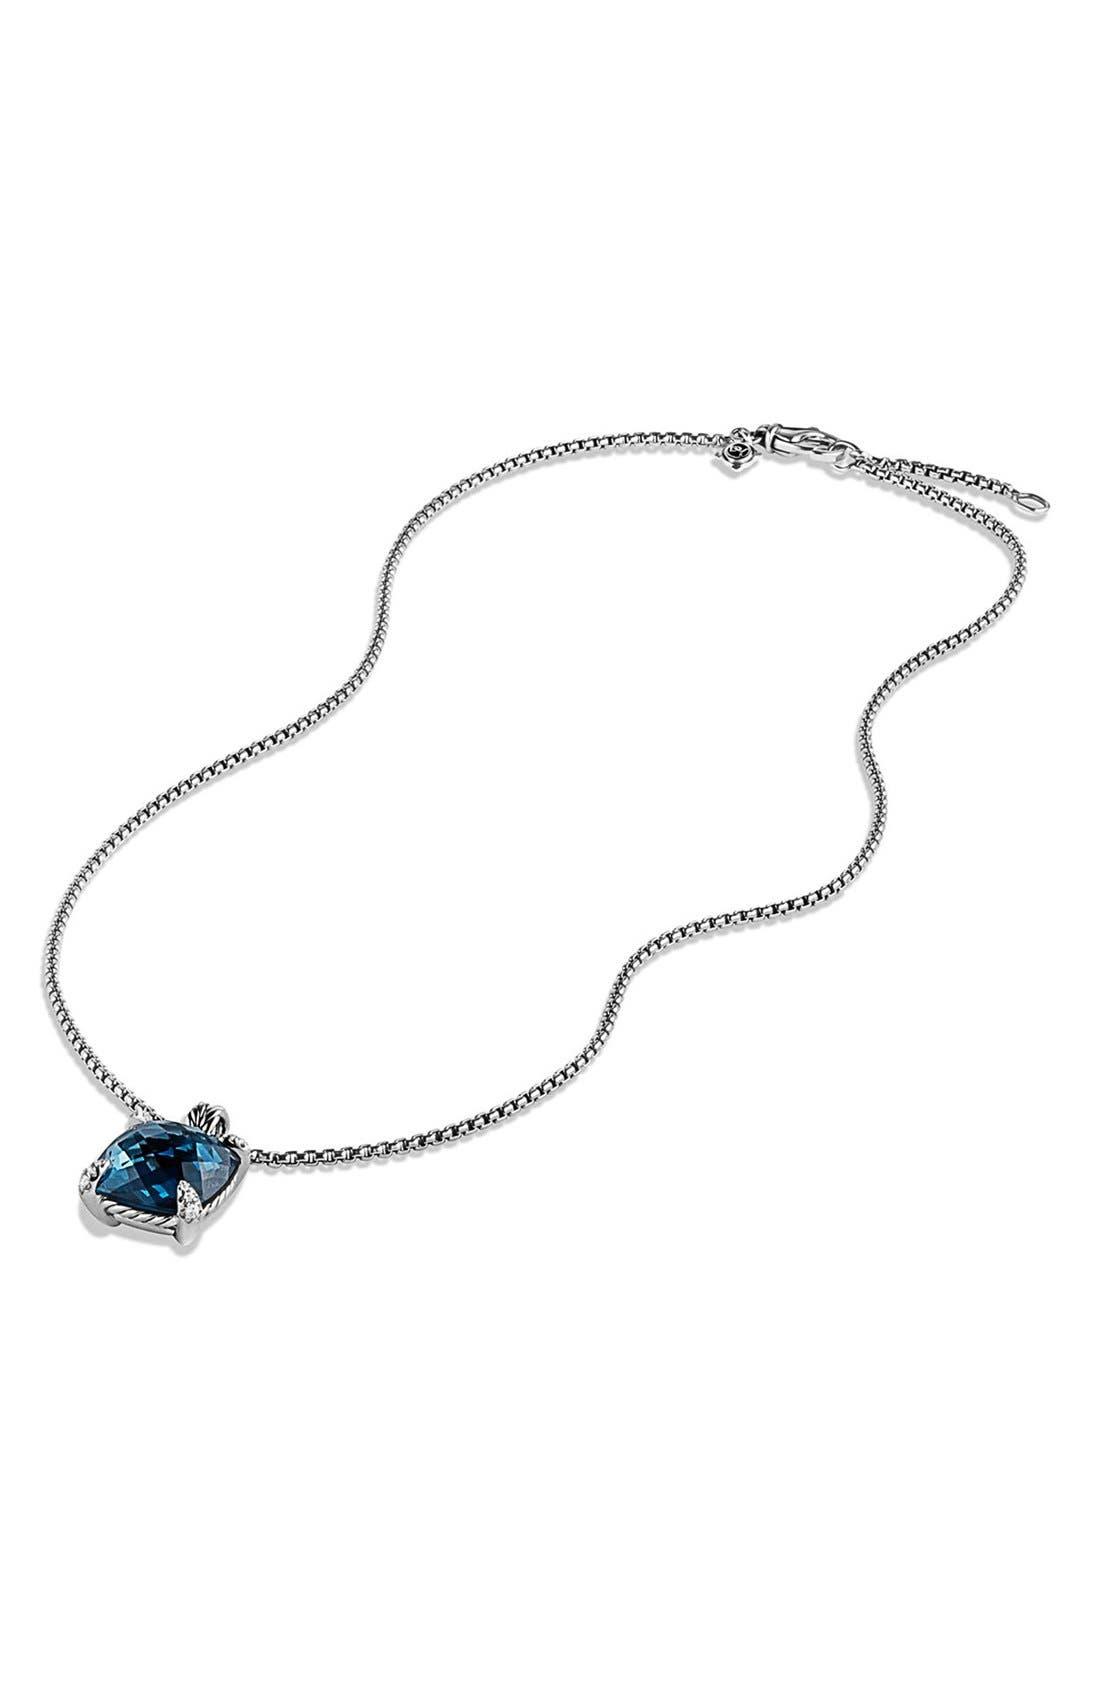 Alternate Image 2  - David Yurman 'Châtelaine' Pendant Necklace with Semiprecious Stone and Diamonds